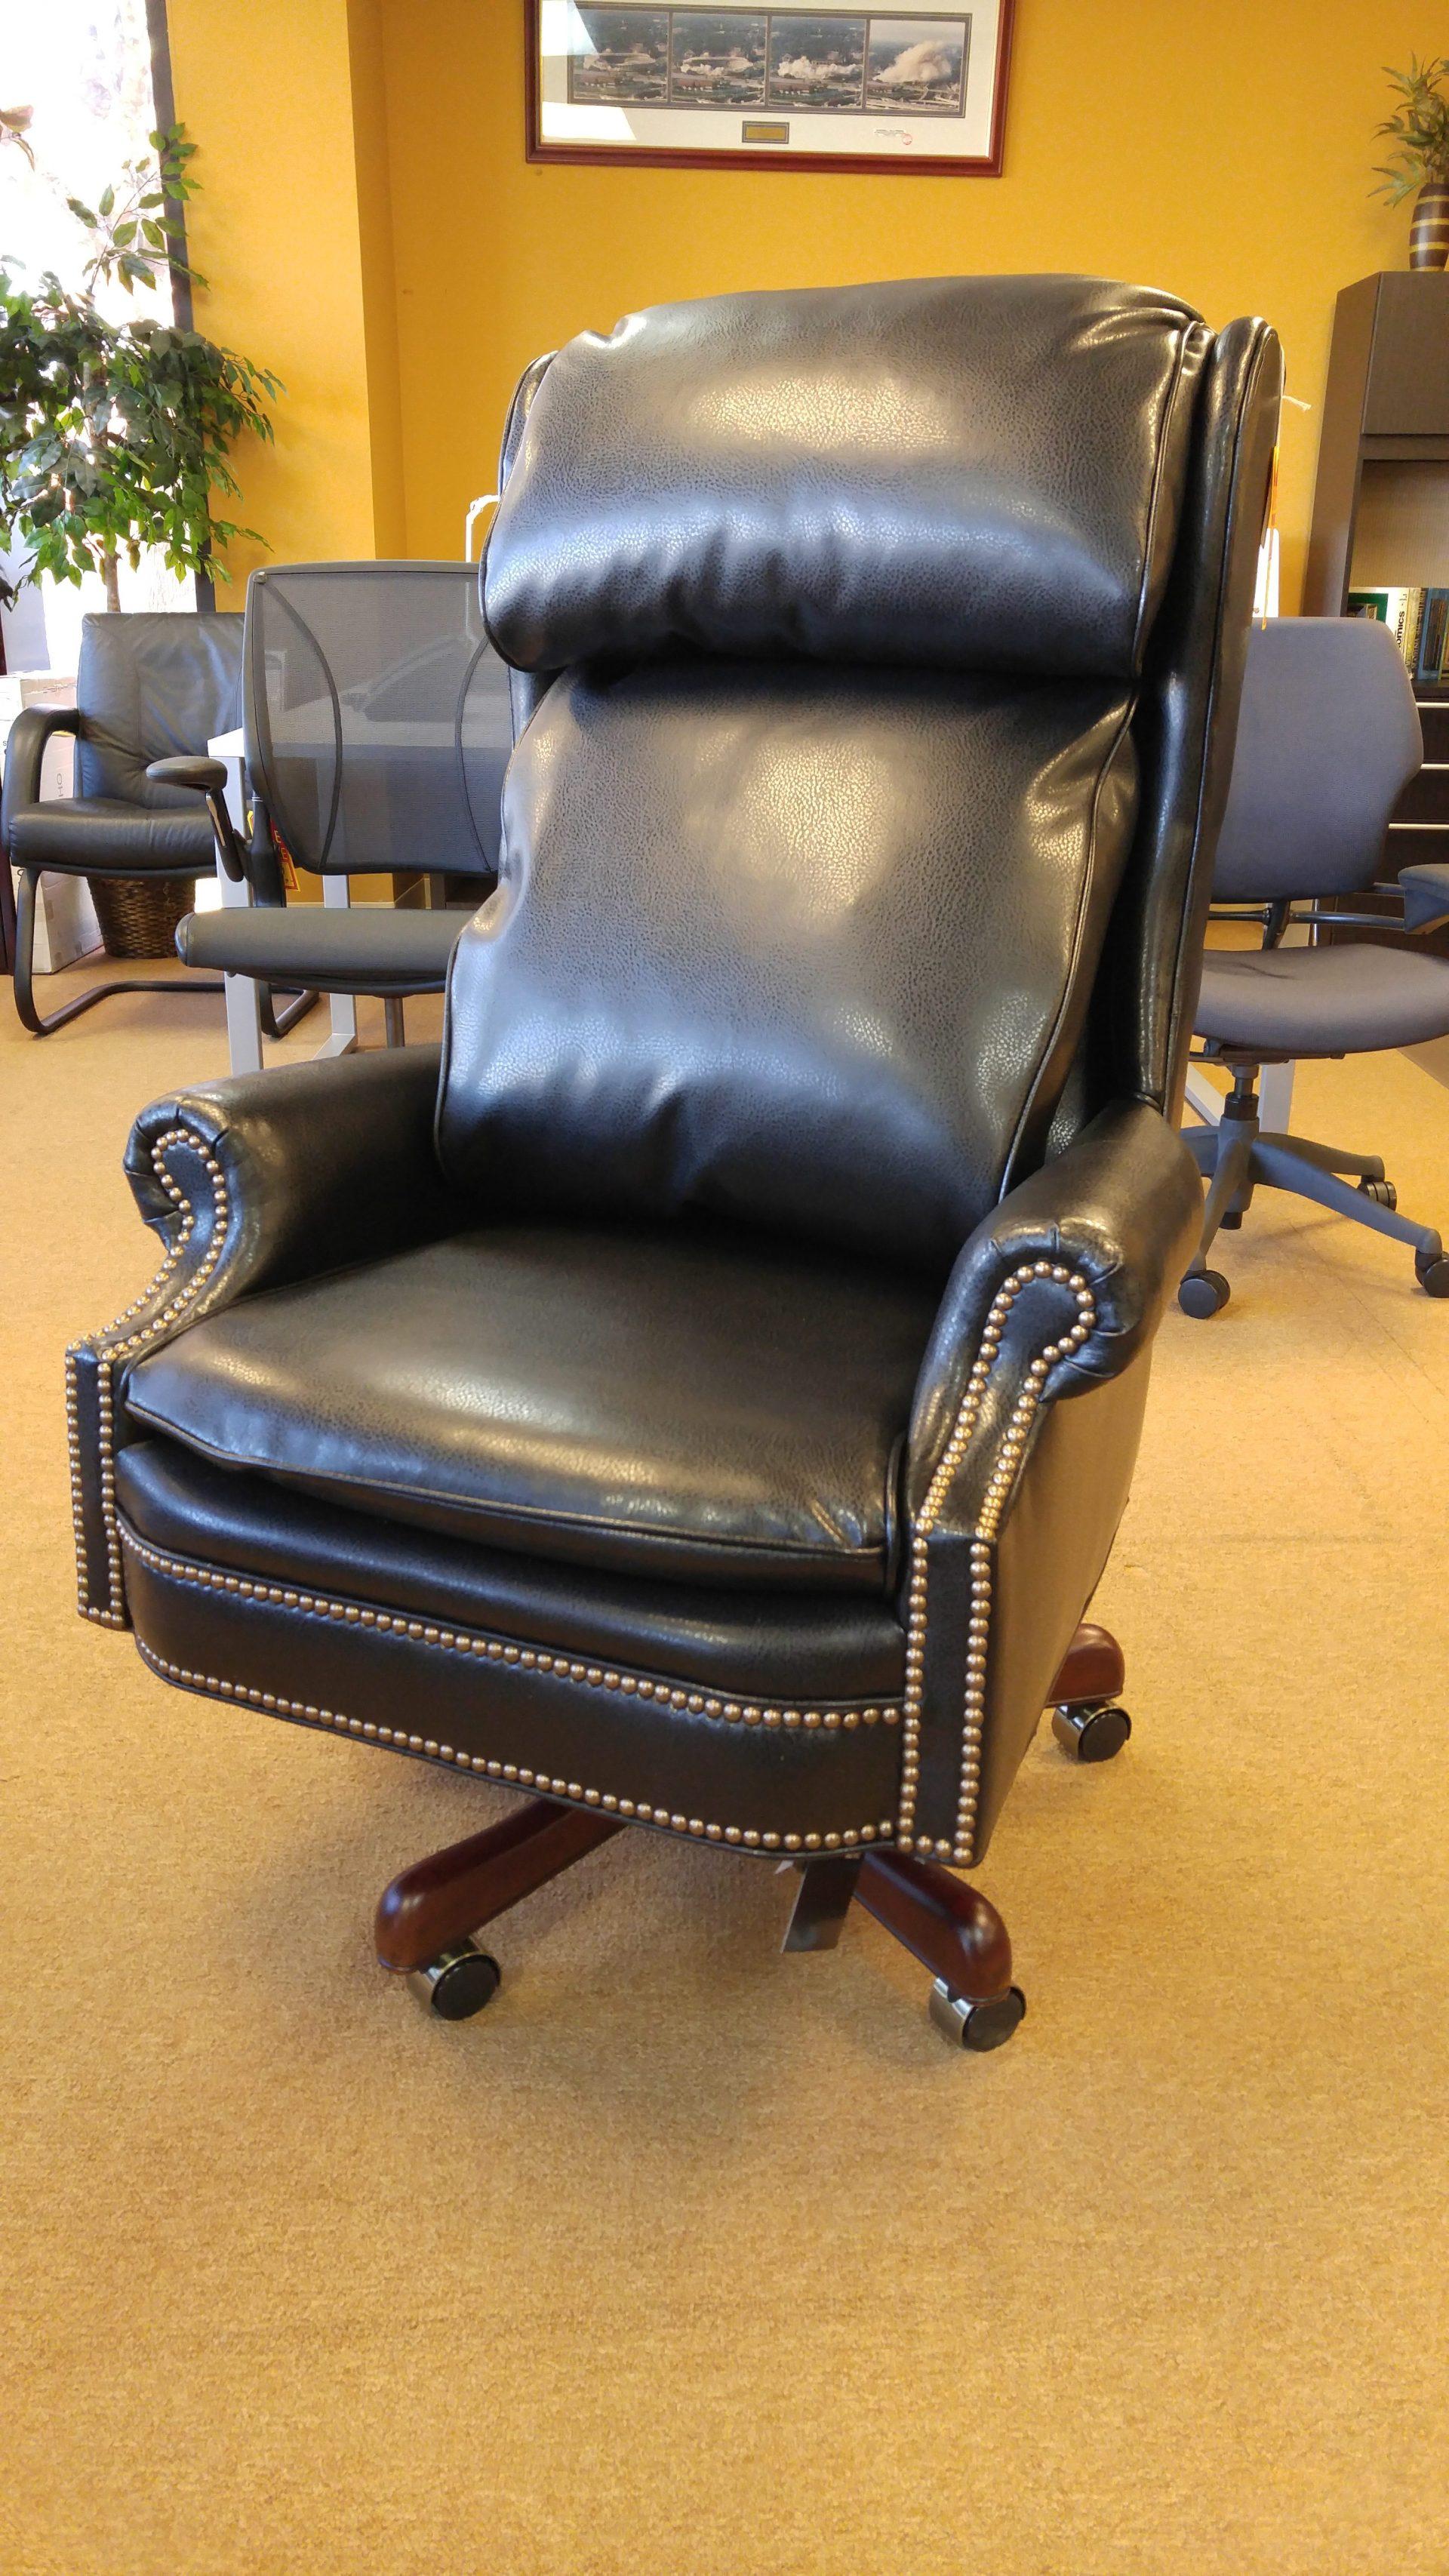 Awesome Executive Swivel Chair North Point Office Furniture Inzonedesignstudio Interior Chair Design Inzonedesignstudiocom